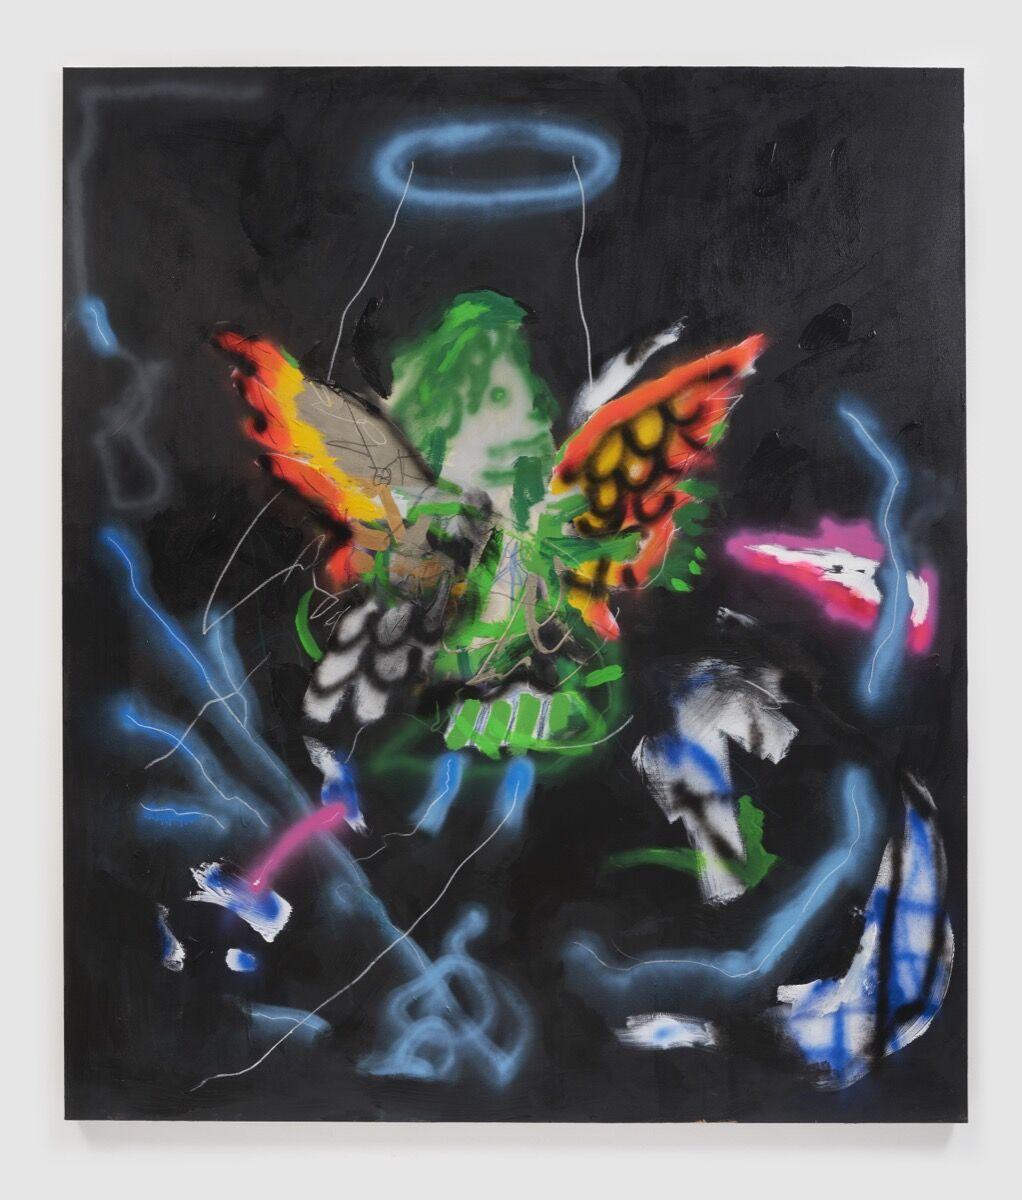 Robert Nava, Night Storm Angel, 2021. © Robert Nava. Courtesy of the artist and Vito Schnabel Gallery.